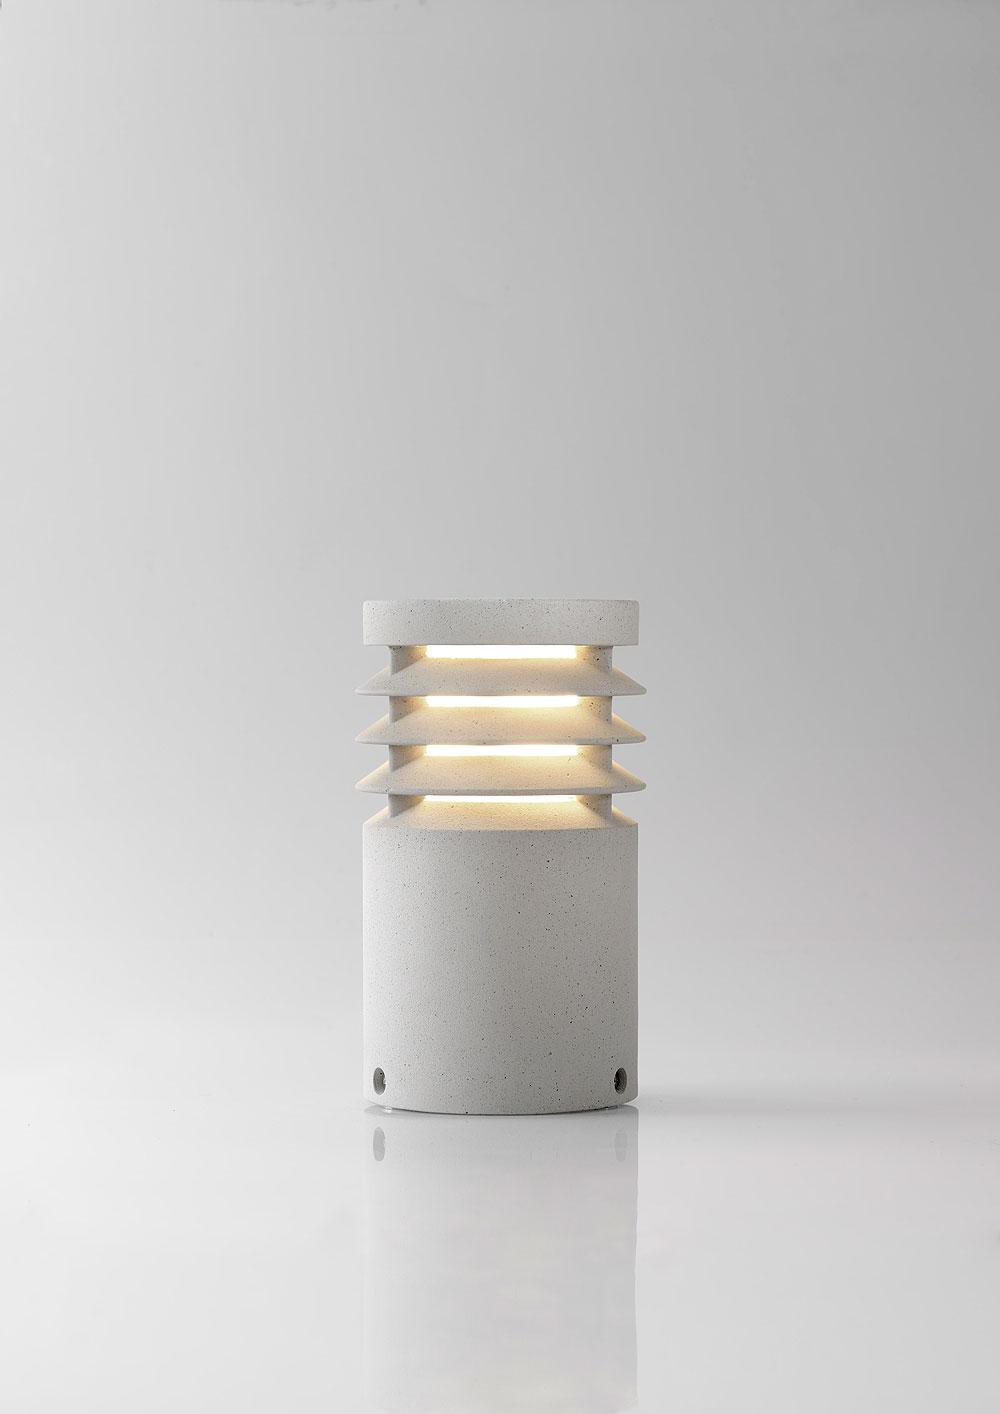 iluminacion-stones-oliver-ramon-ubeda-otto-canalda-metalarte (4)